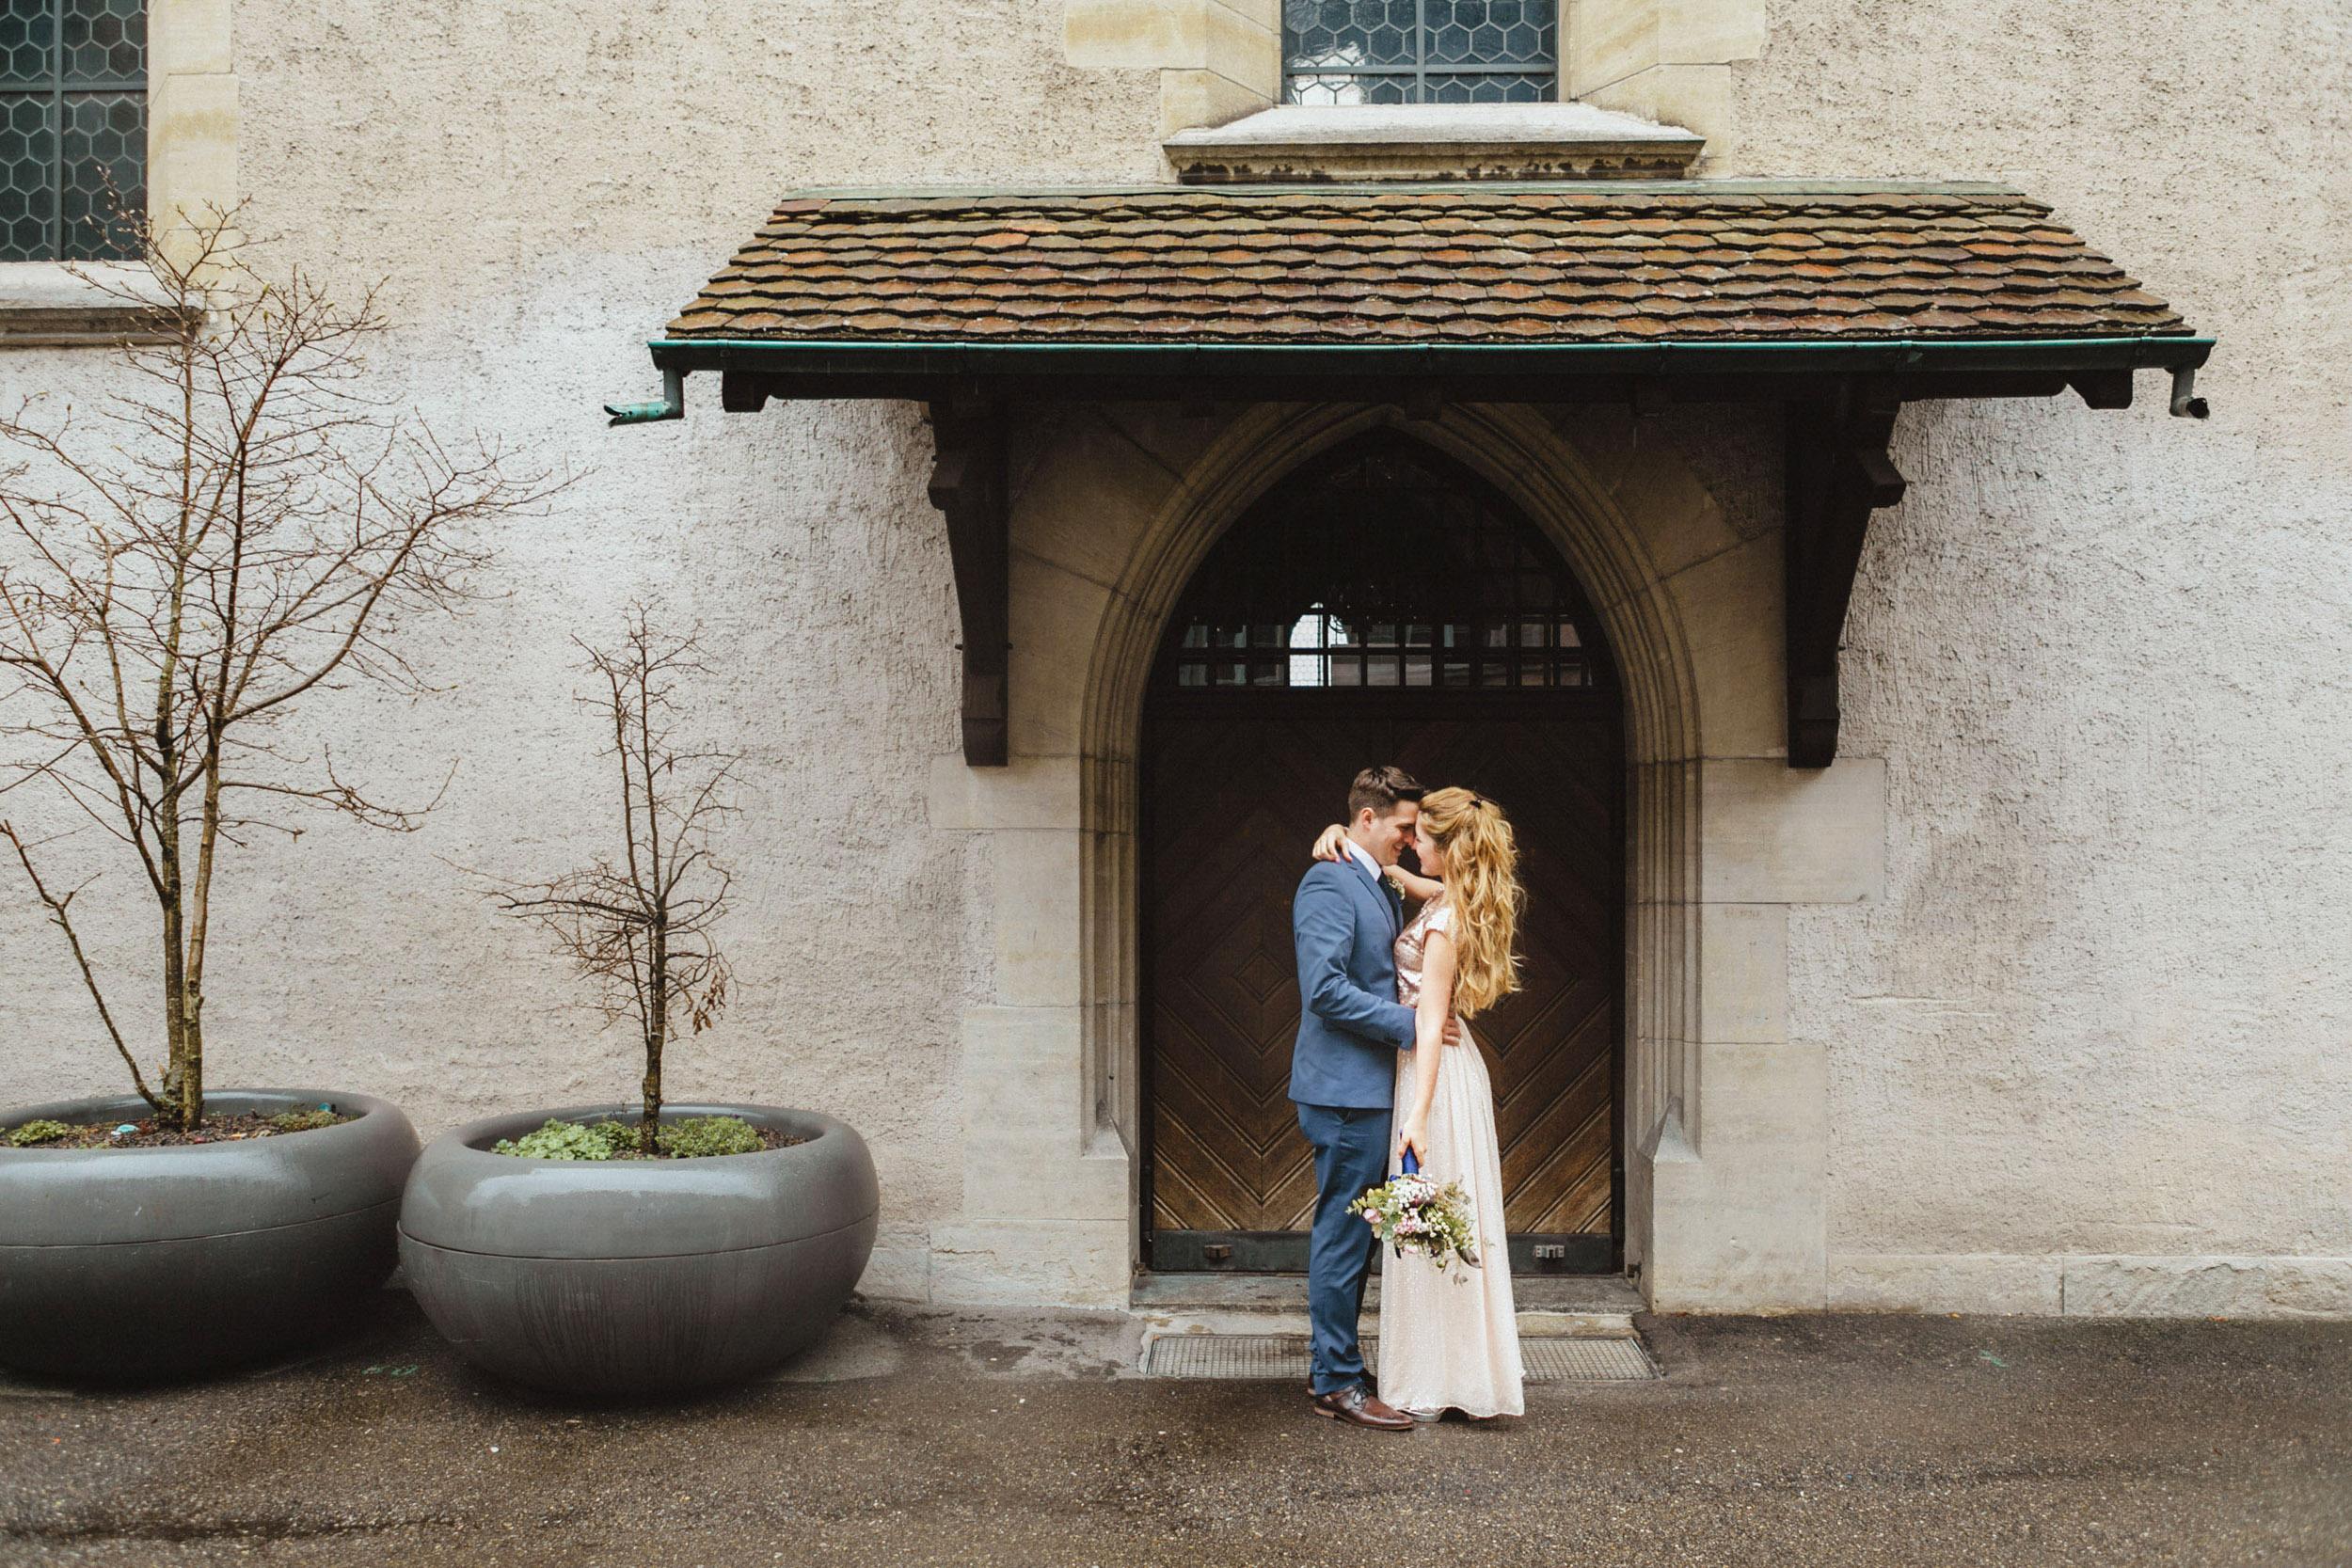 hochzeitsfotografie-schweiz_wedding-photographer-switzerland-europe_Bendik-Photography-016